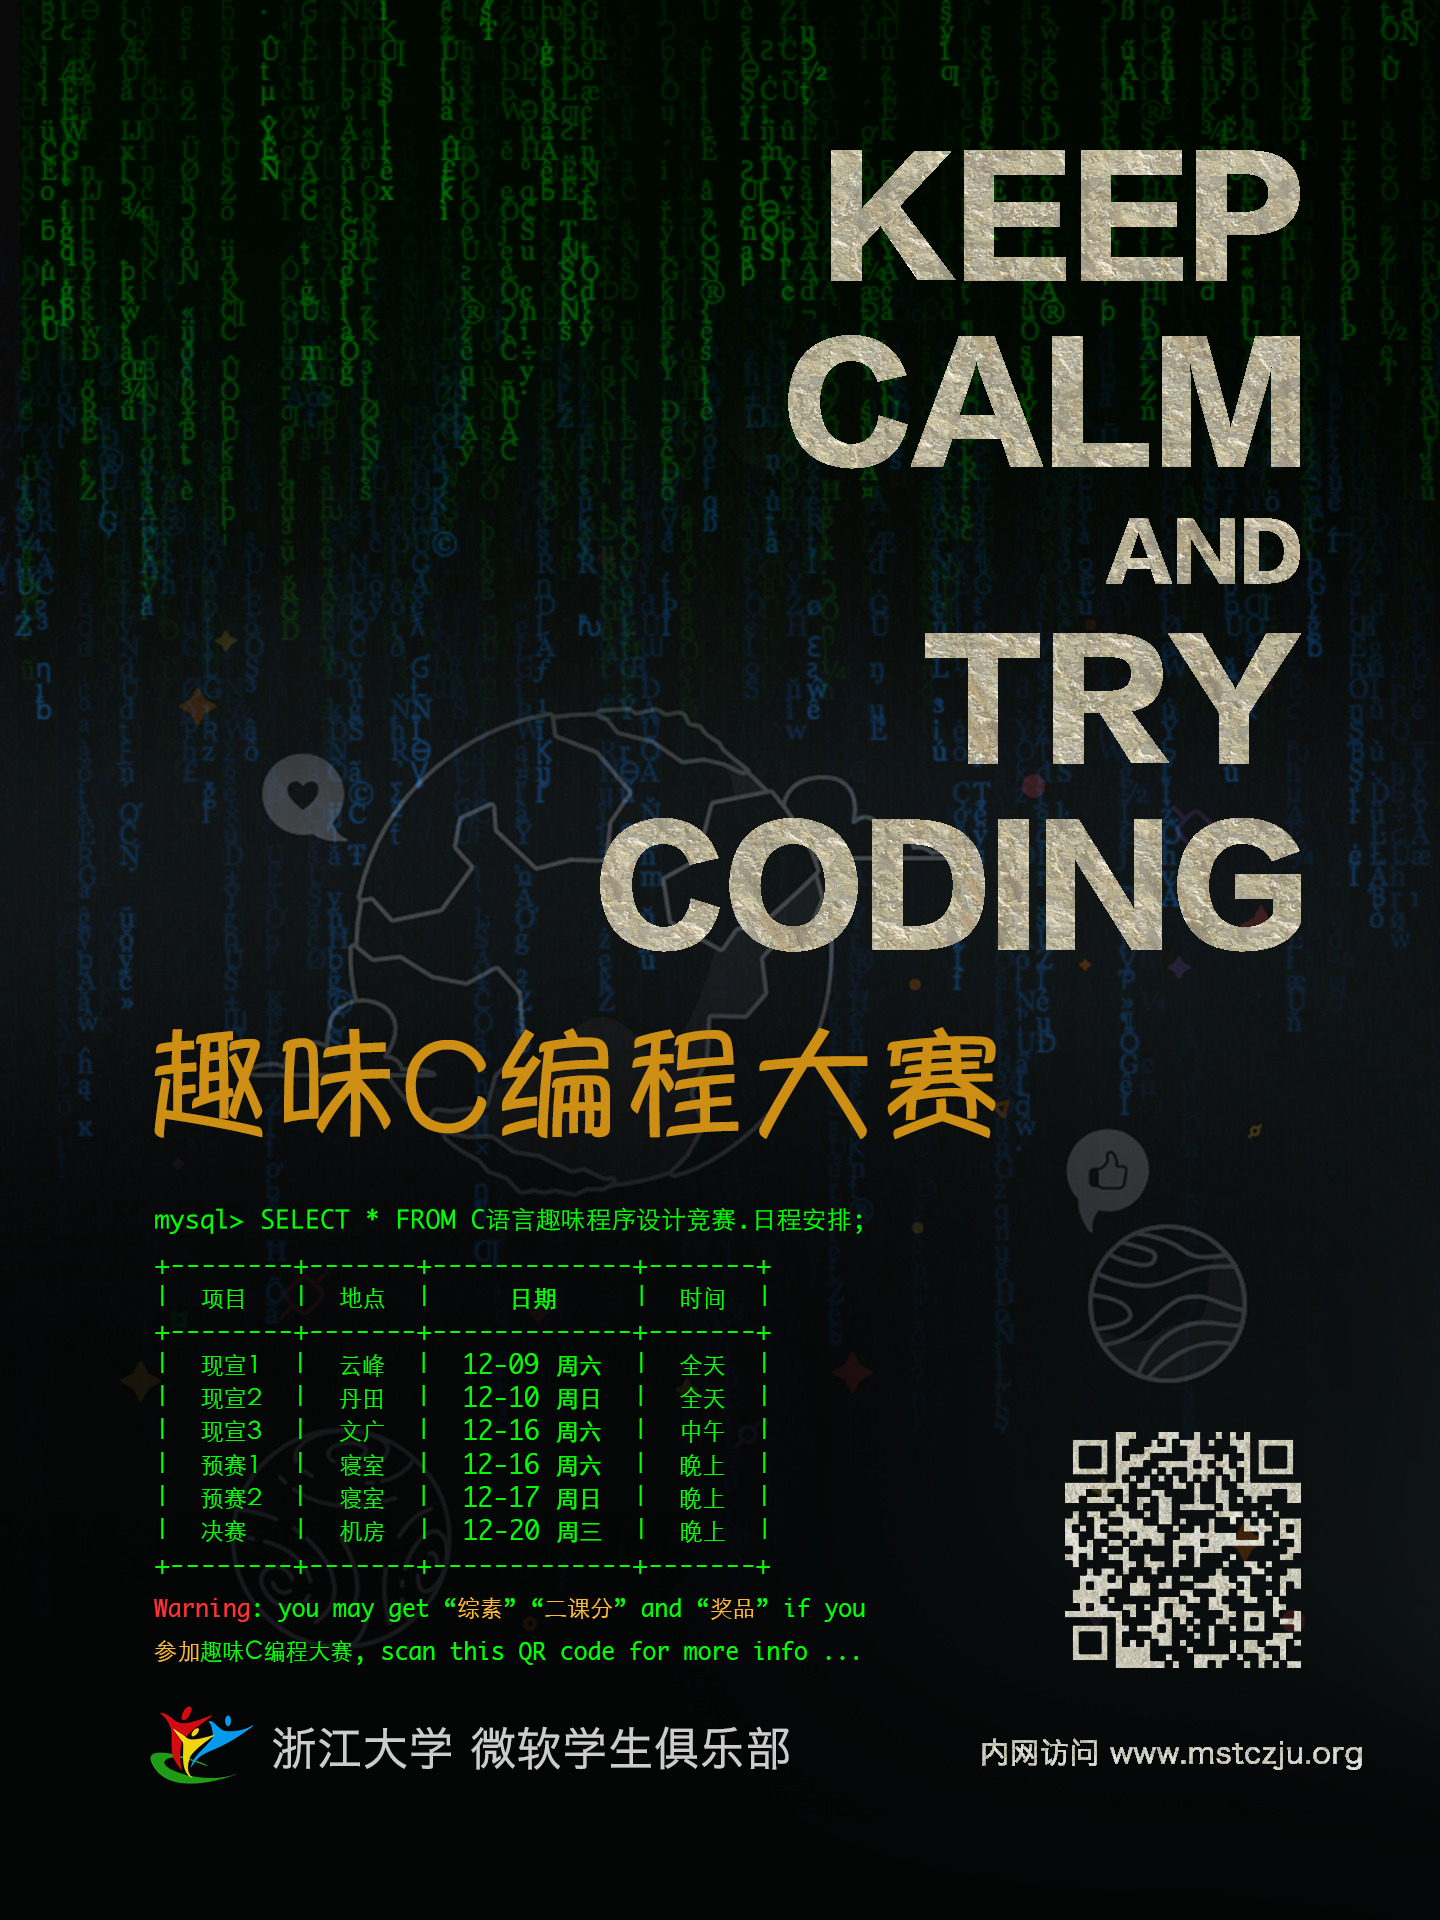 MSC 微软学生俱乐部 趣味C编程大赛 海报 keep calm and try coding